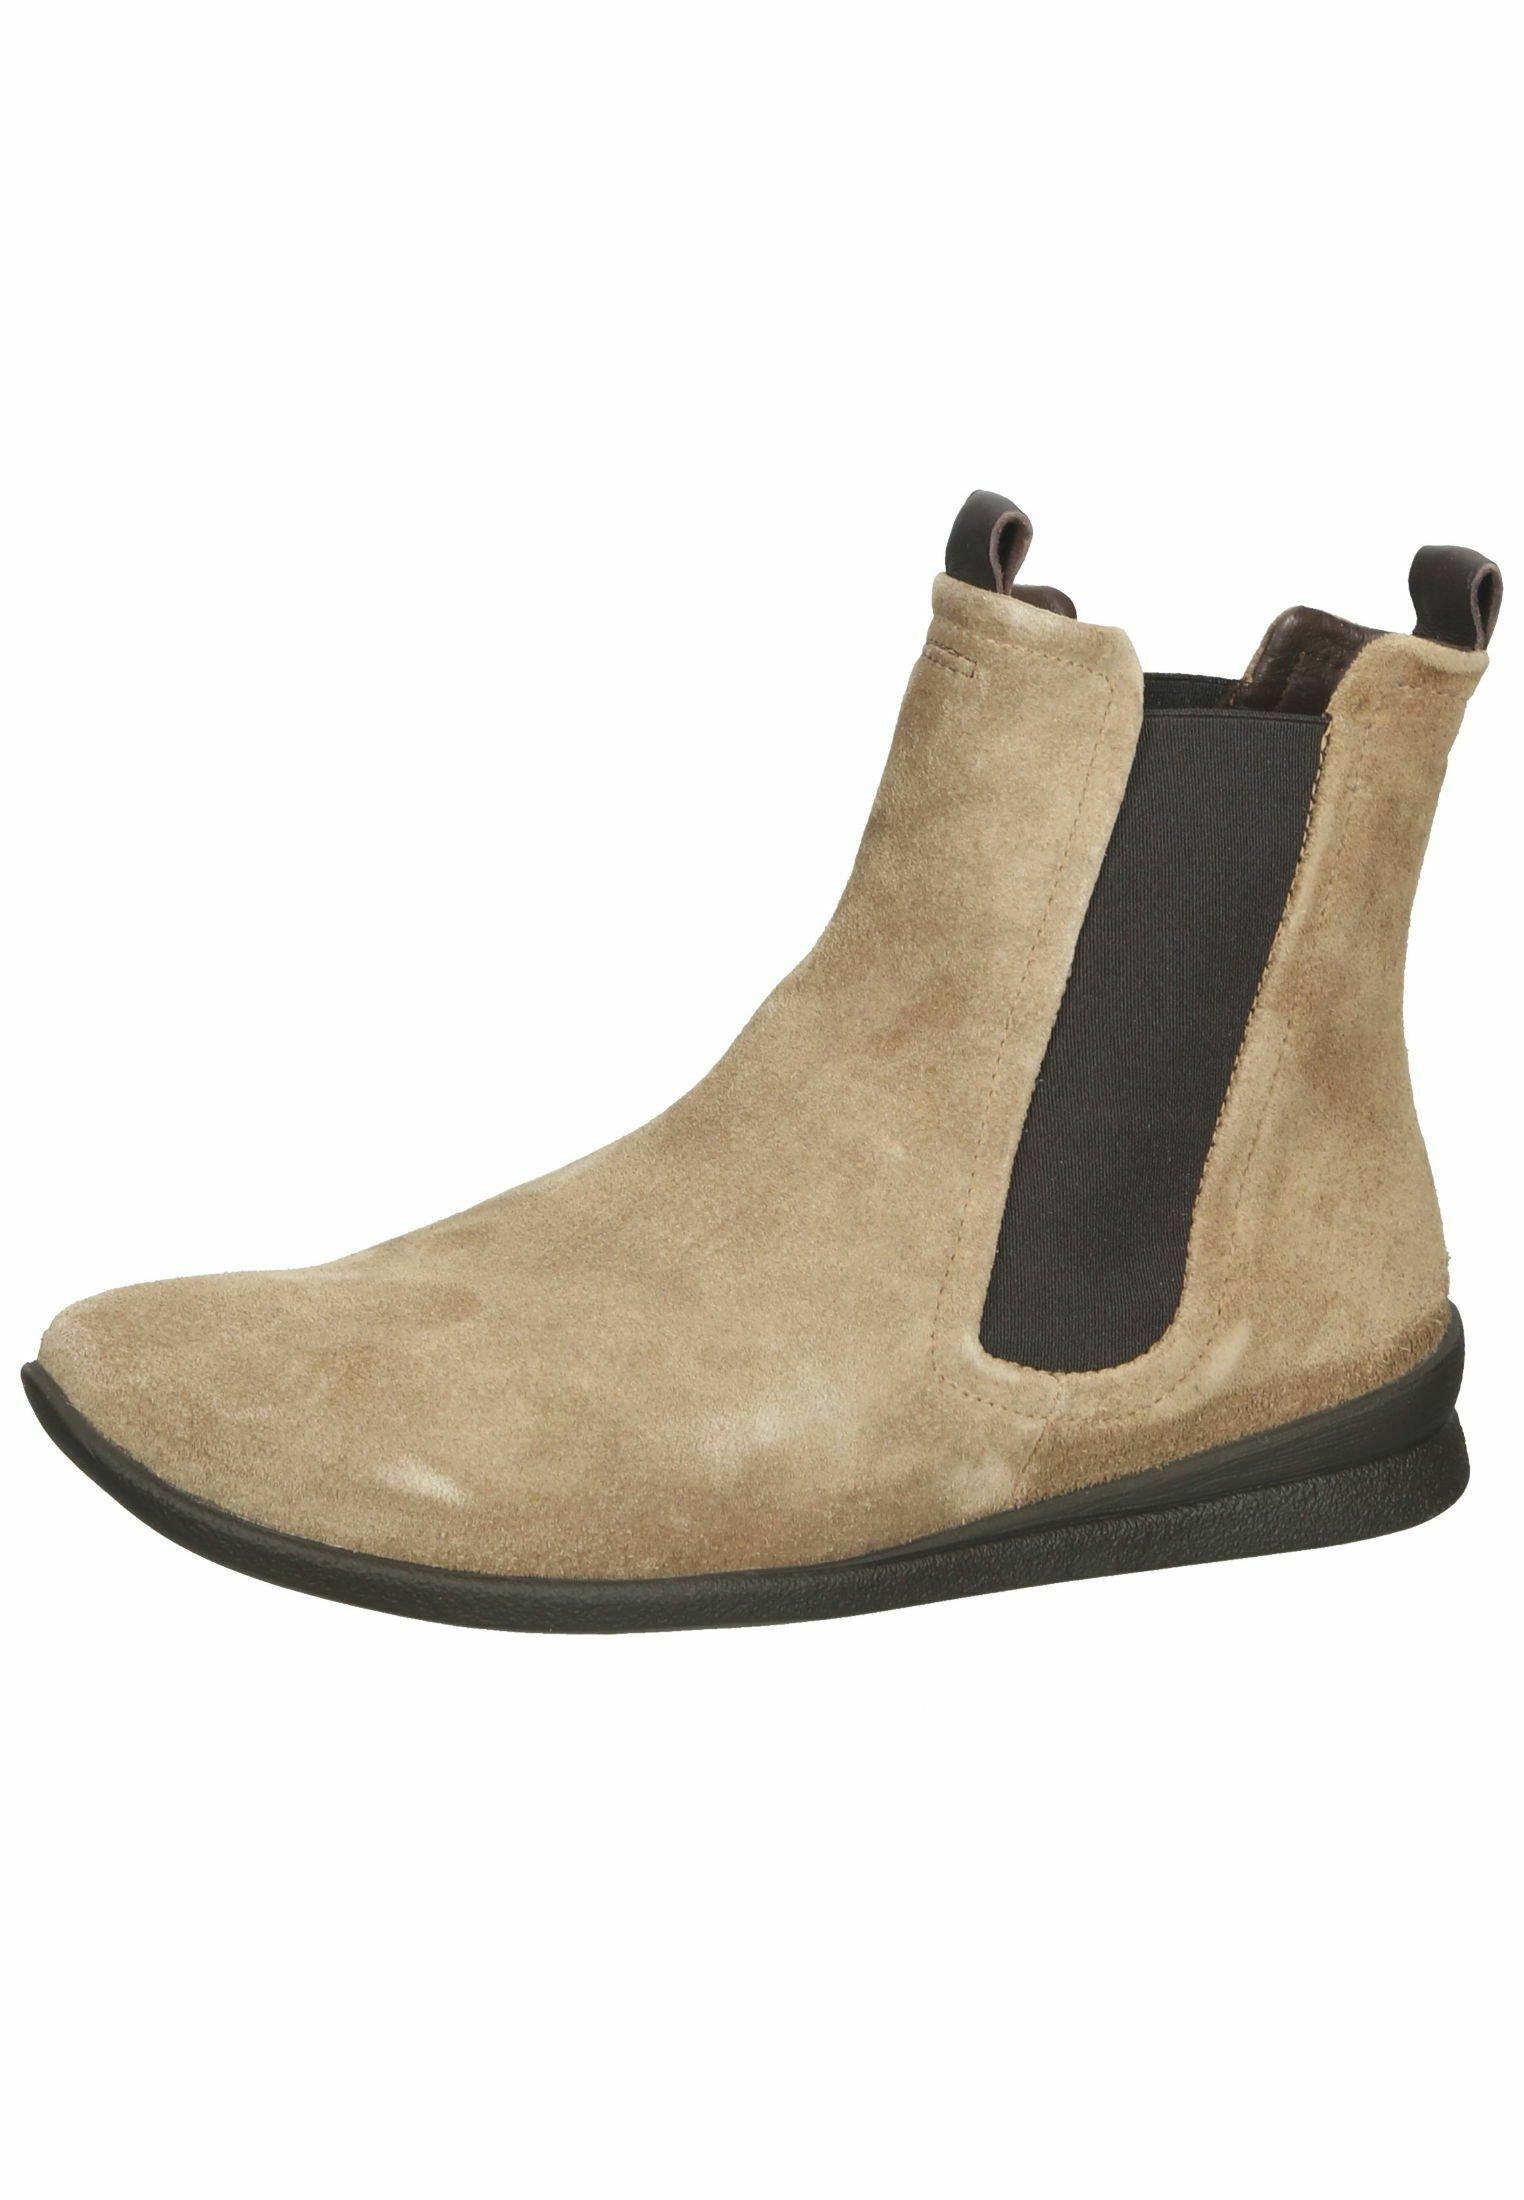 Damen Ankle Boot - ahorn/kombi